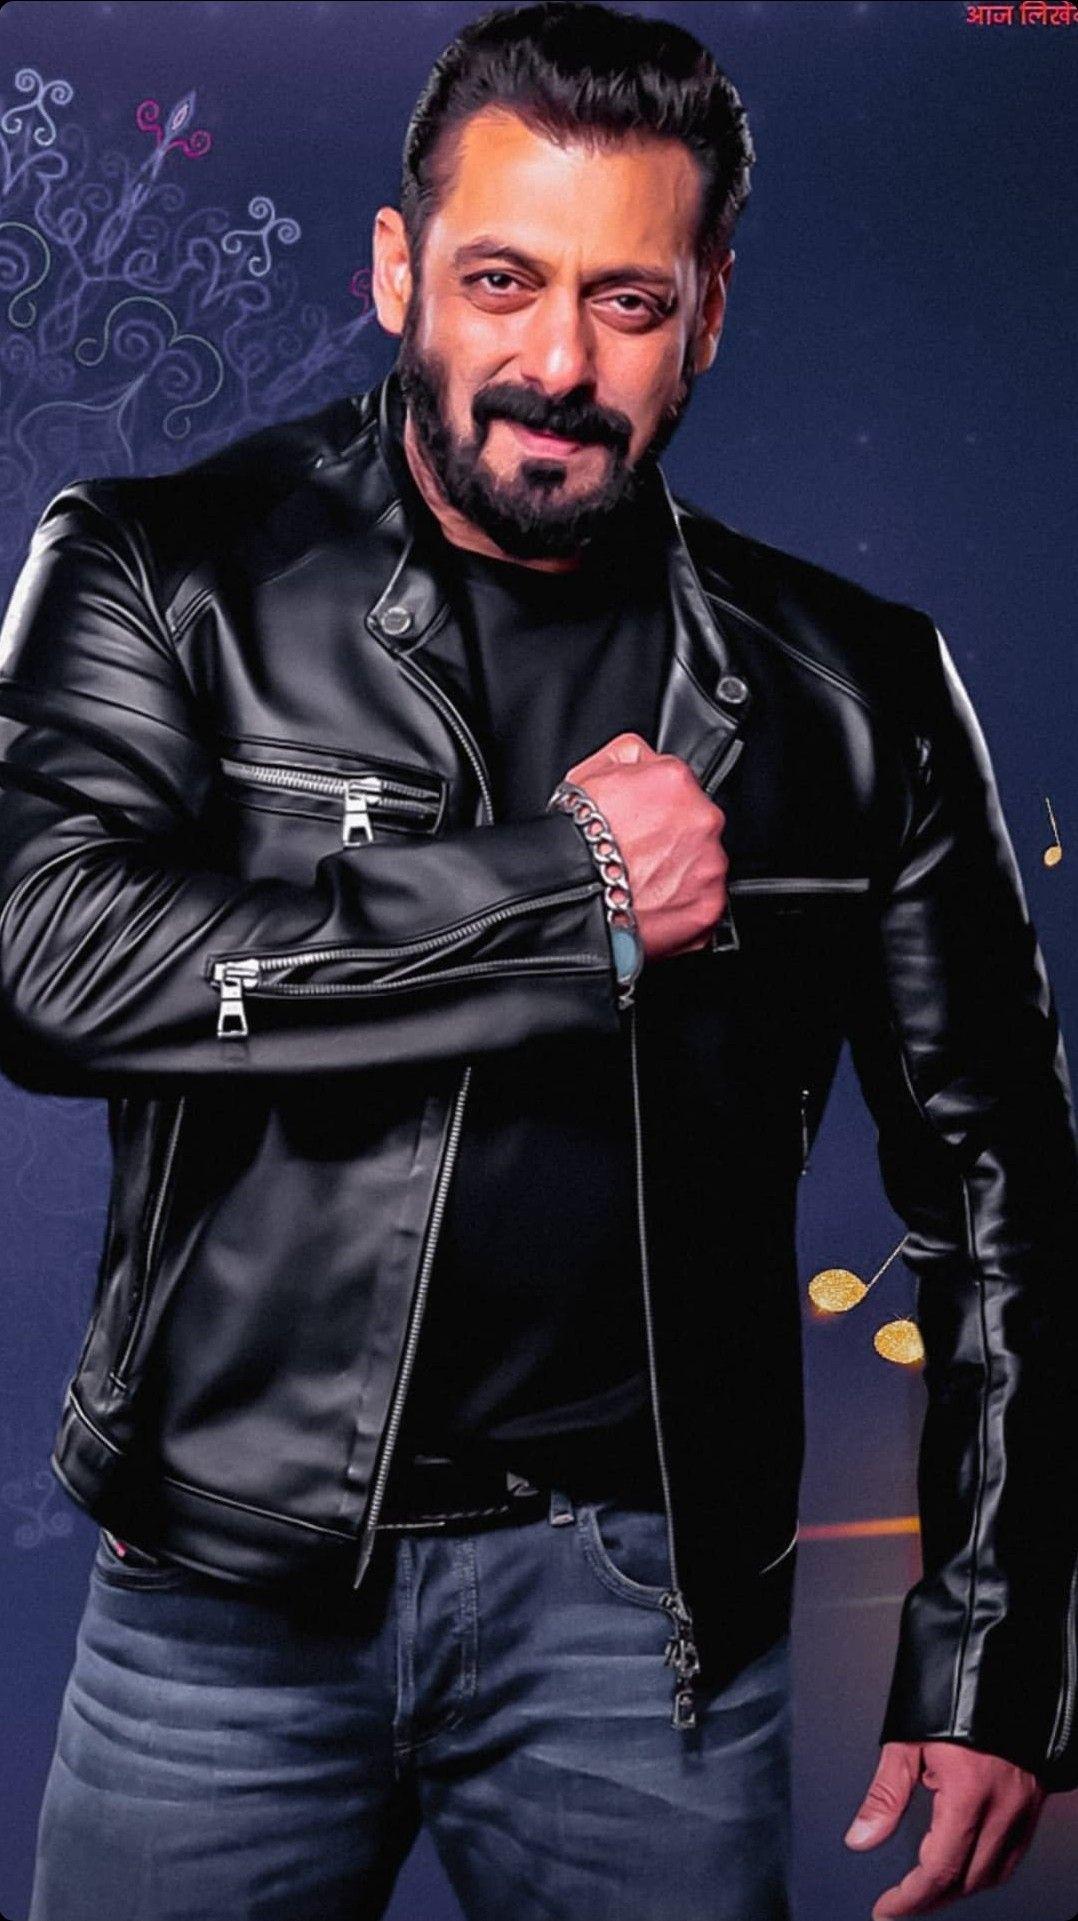 Pin By Ubbsi On Salman Khan In 2021 Leather Jacket Men Mens Jackets Leather Jacket [ 1921 x 1078 Pixel ]